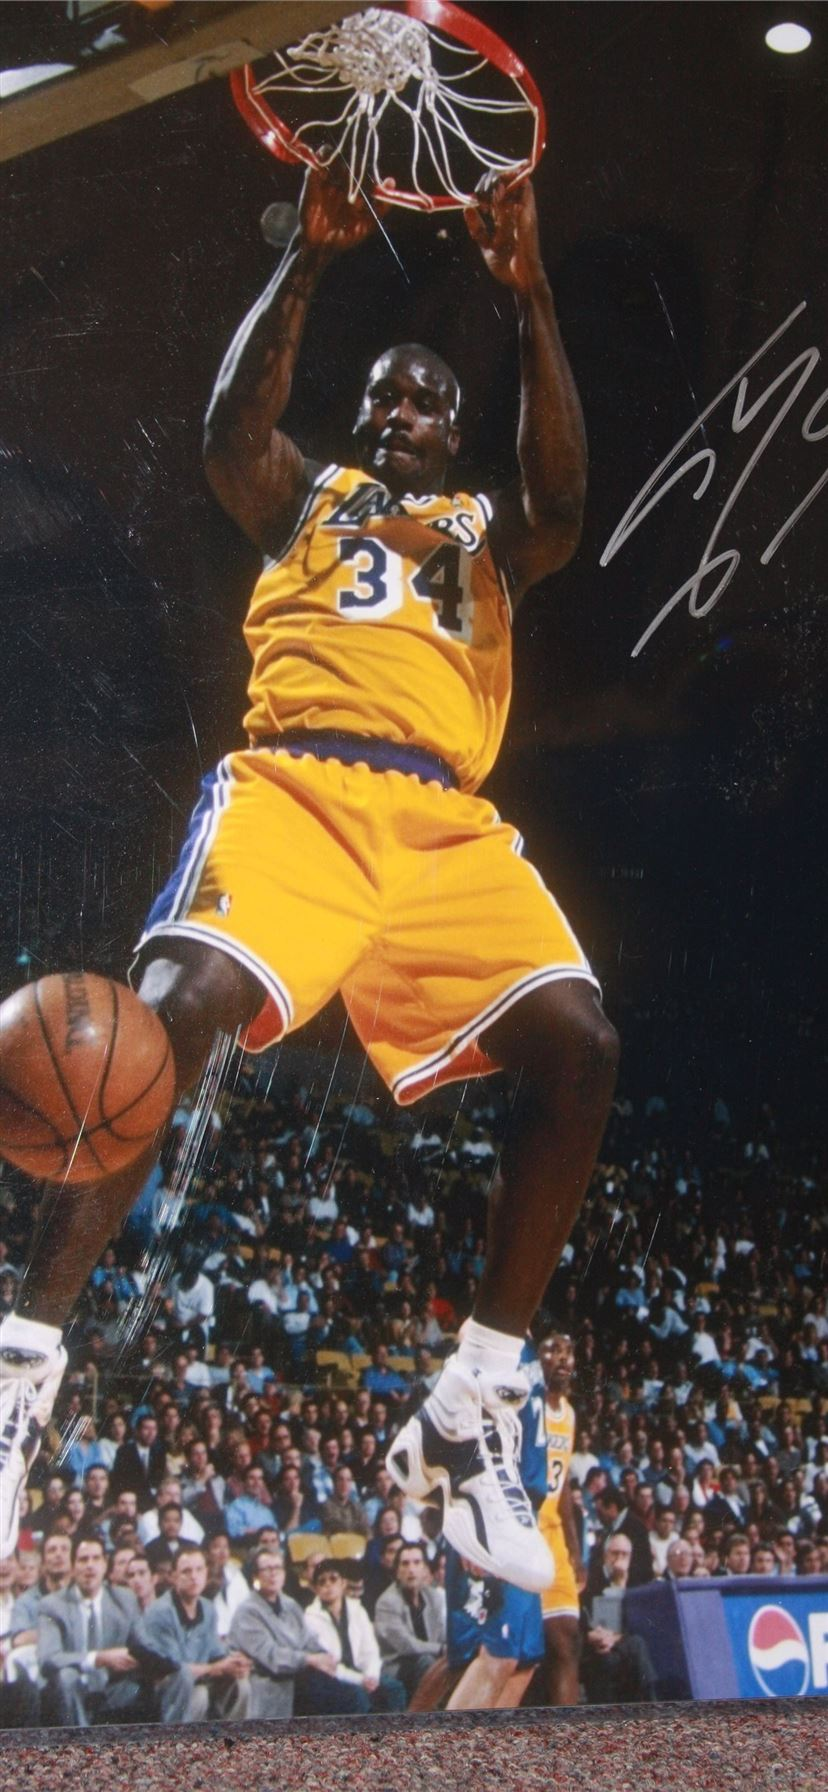 Best Basketball Celebrity Iphone 11 Wallpapers Hd Ilikewallpaper